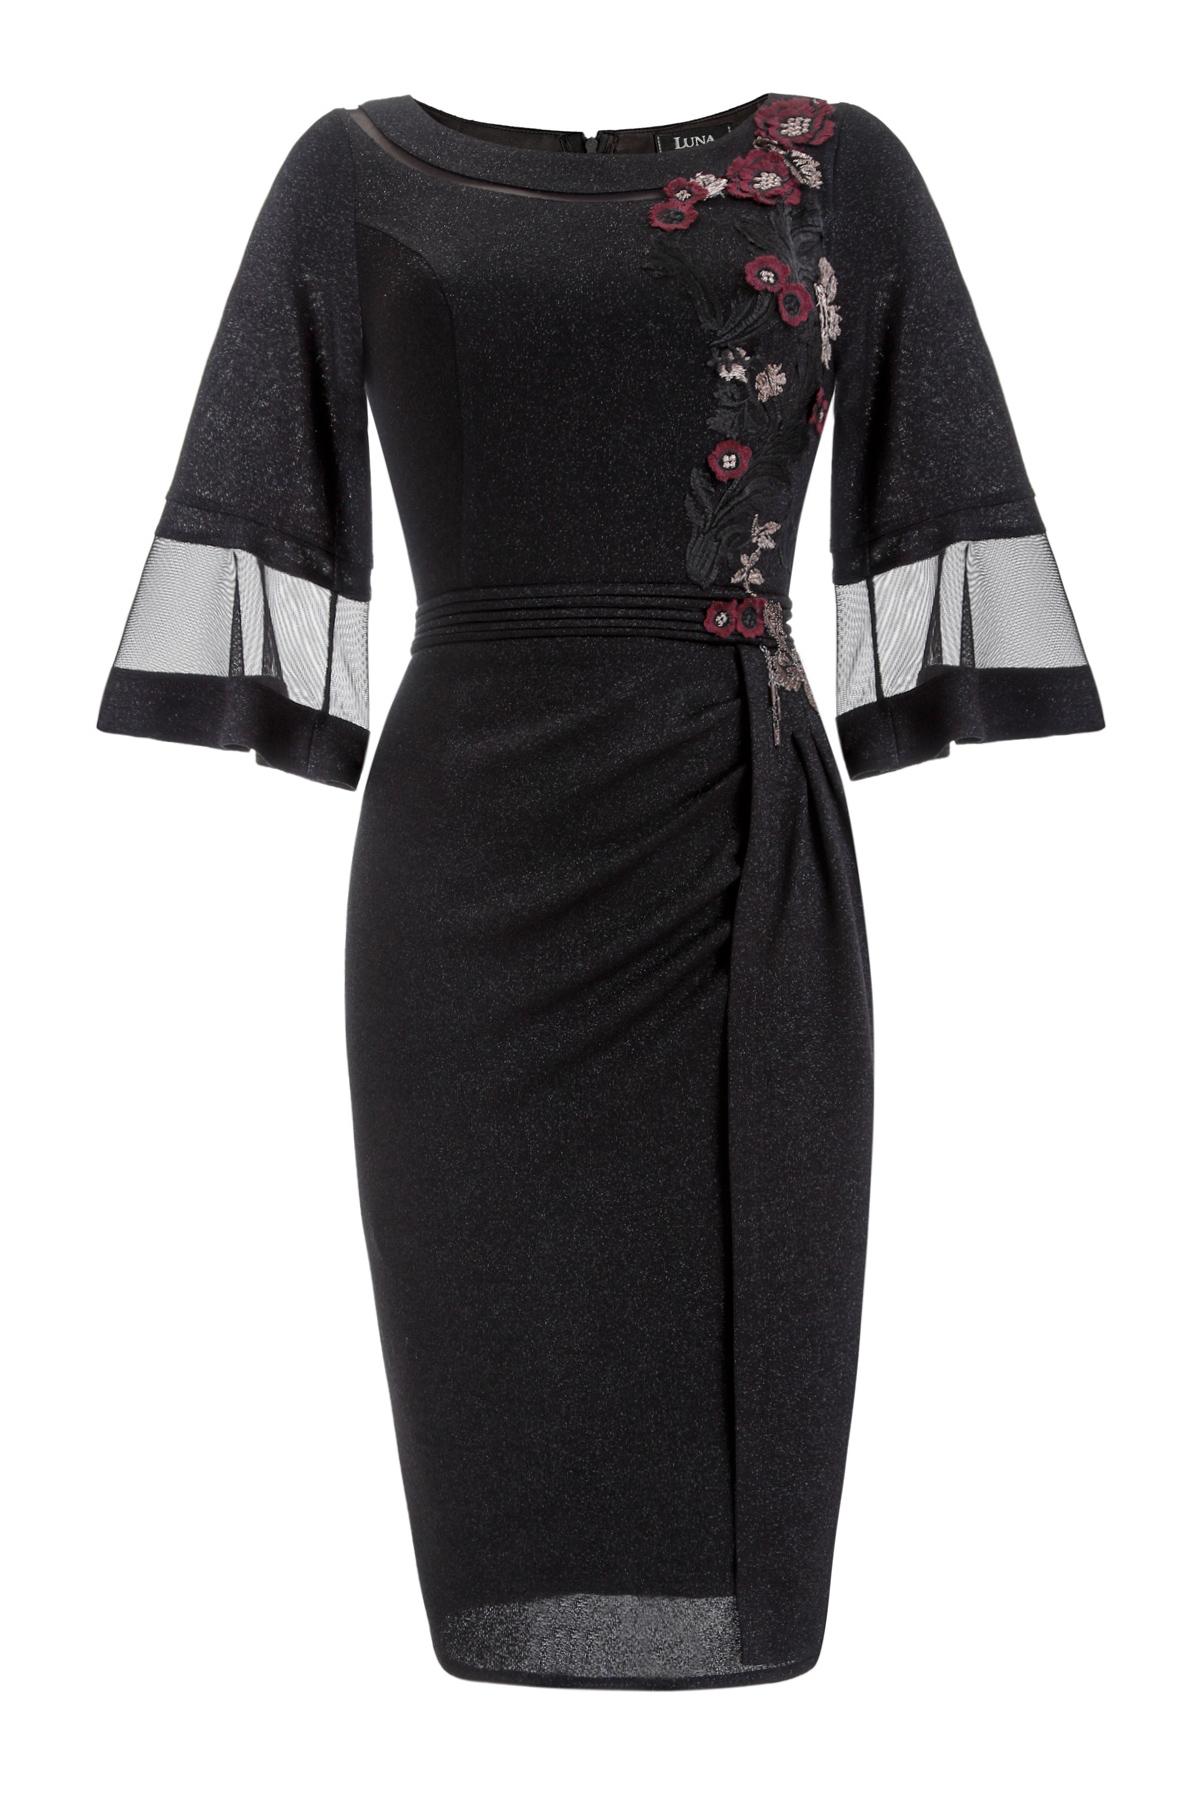 NARROW DRESS RIA